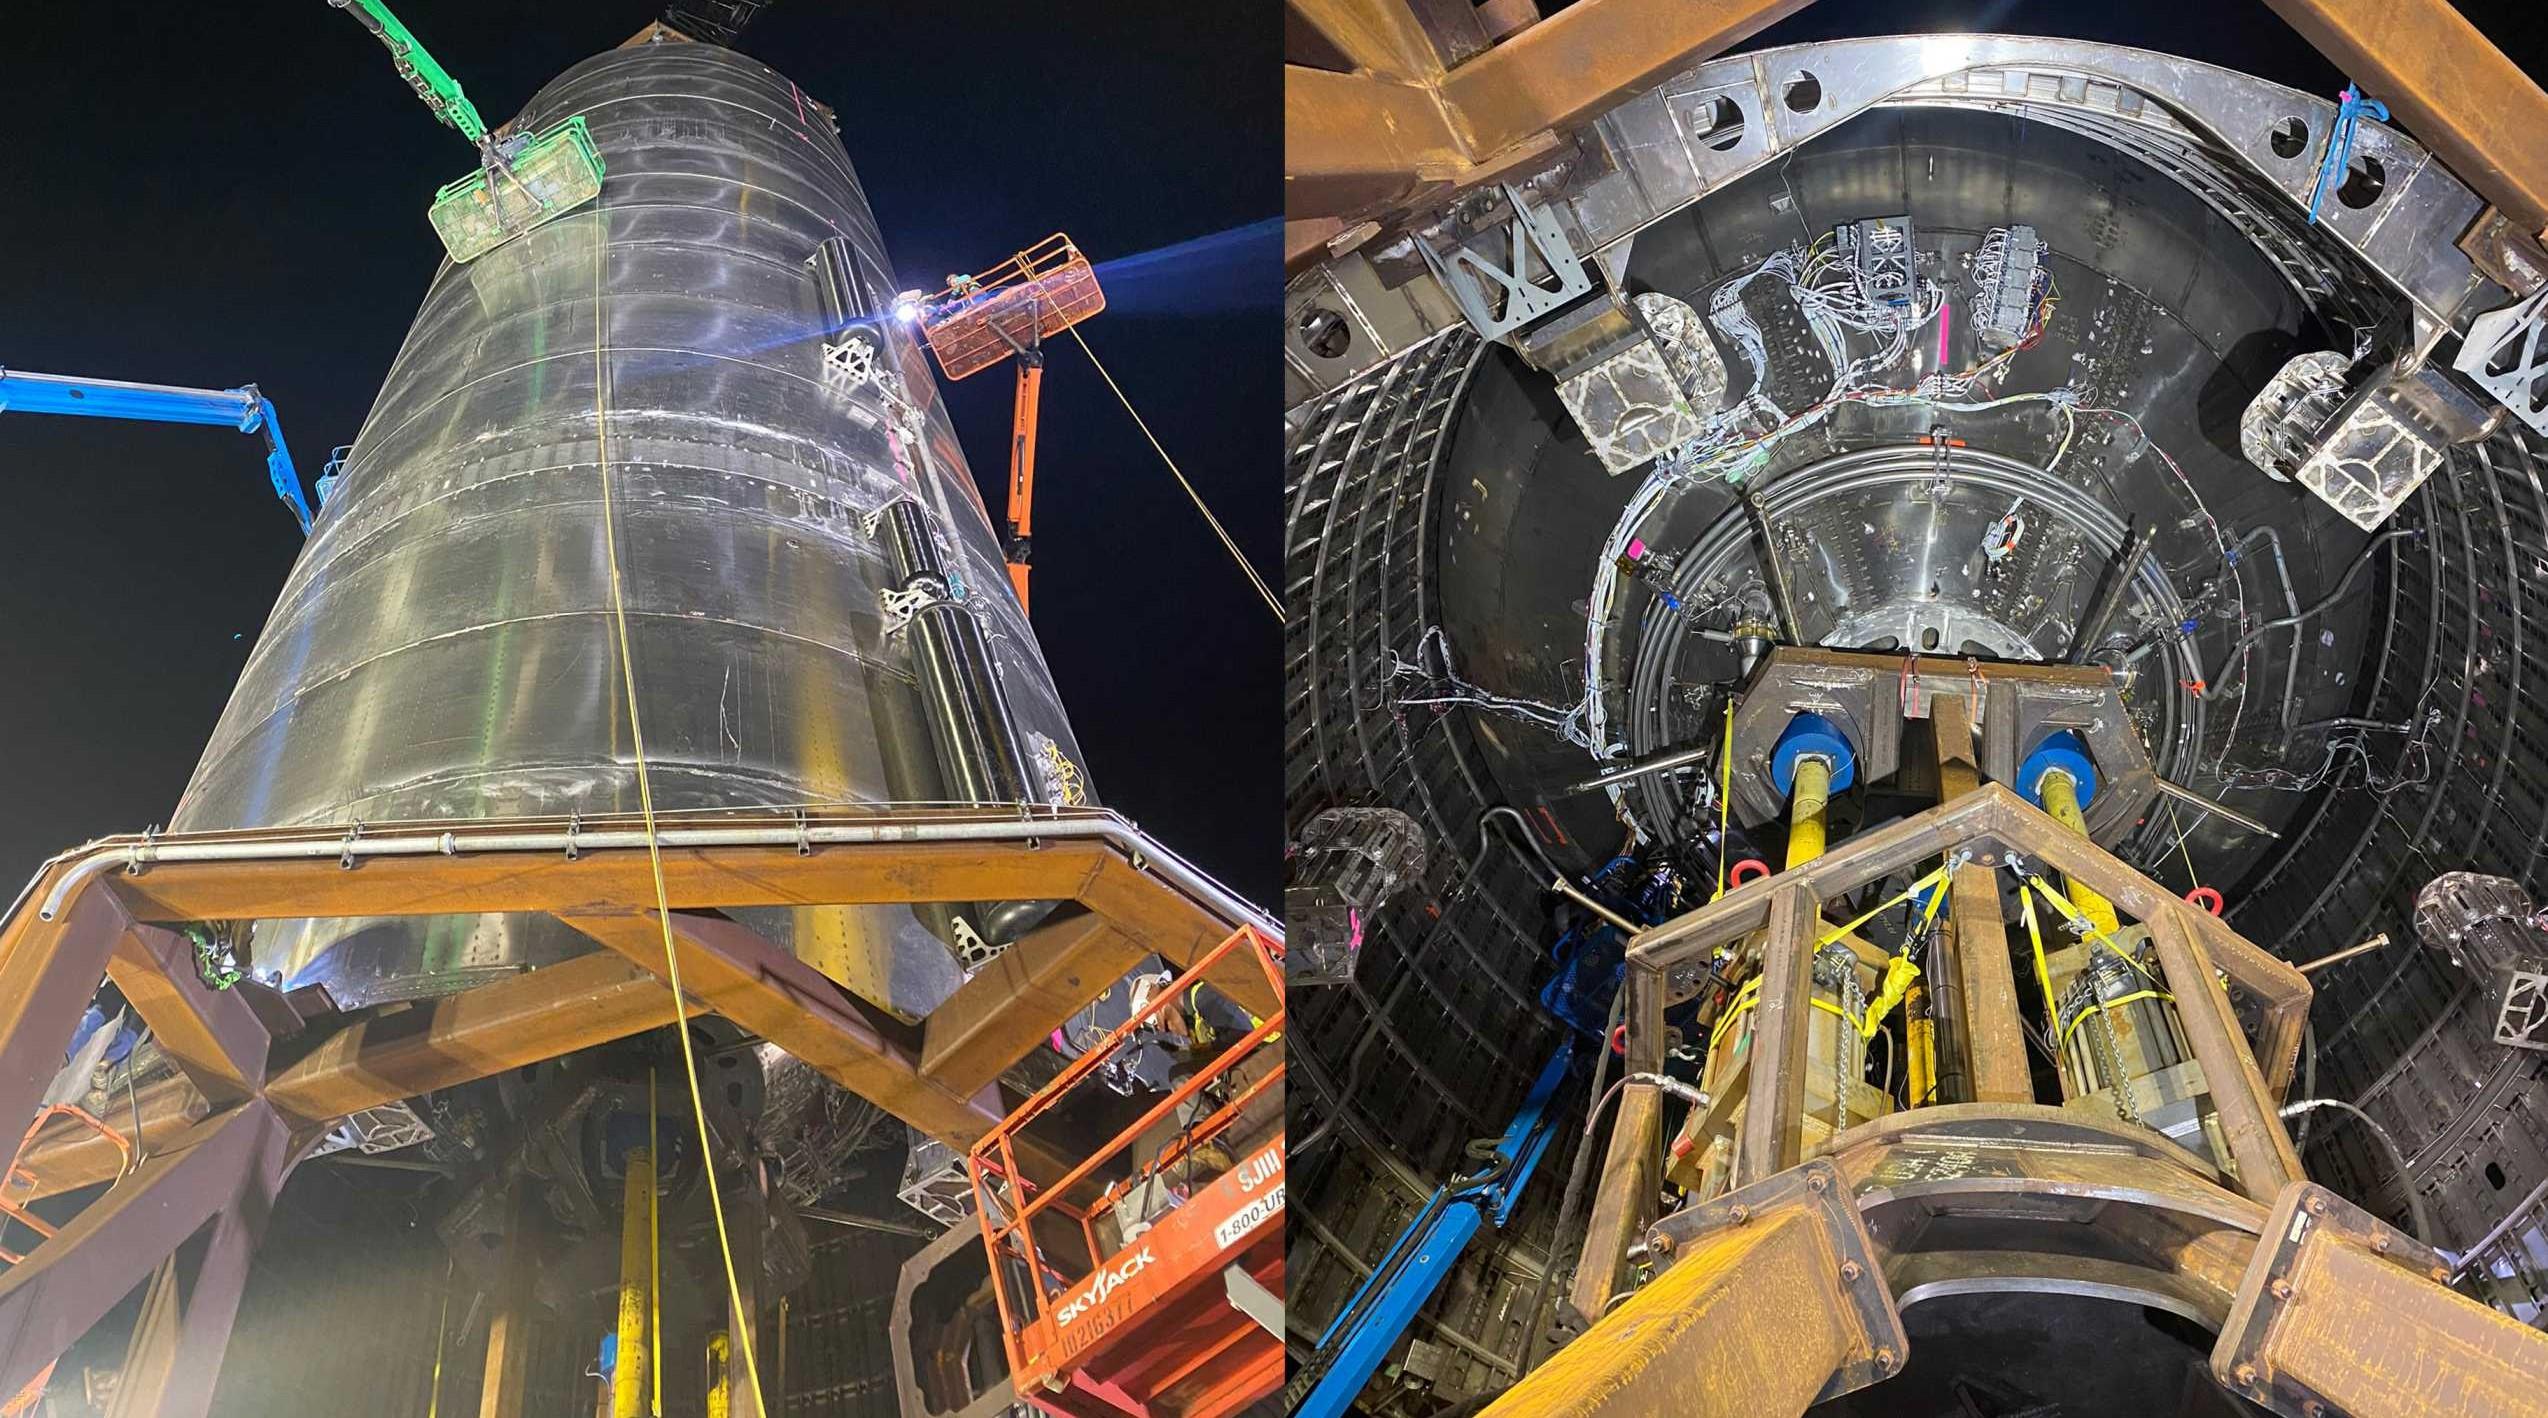 Starship SN3 pad work 032920 (Elon Musk) panel 1 (c) 1